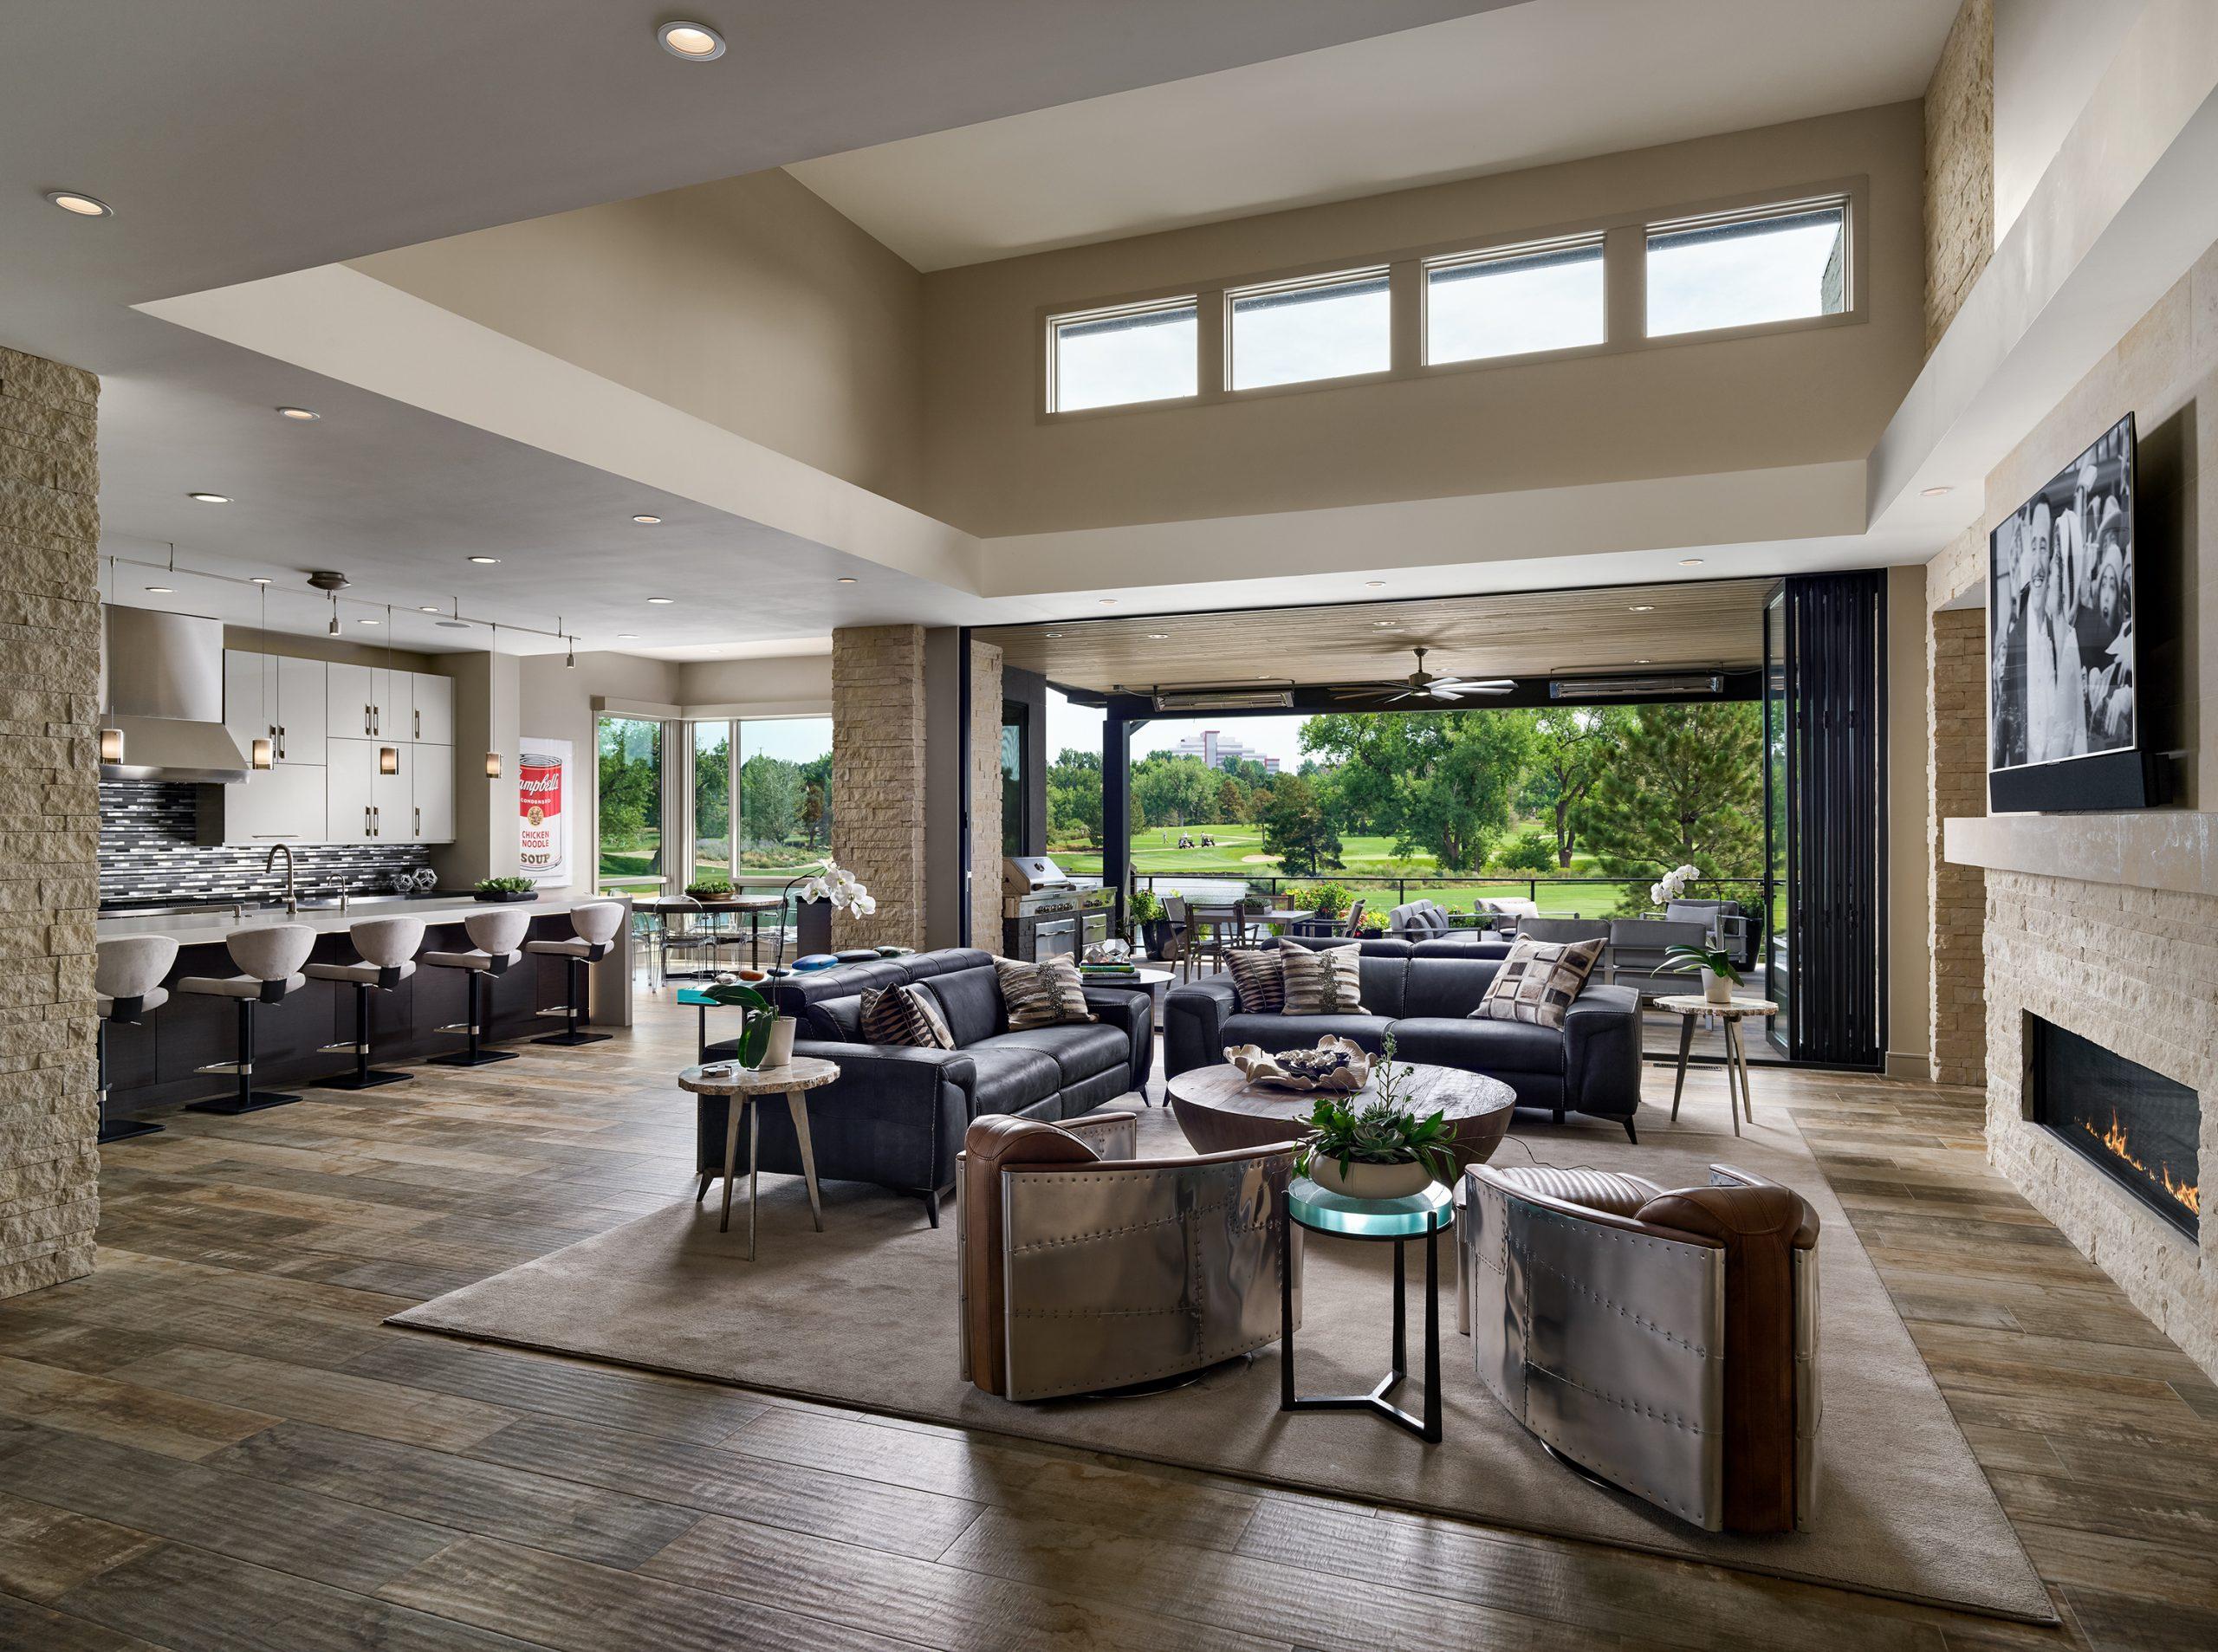 Indoor outdoor room designed by godden sudik architects in denver colorado